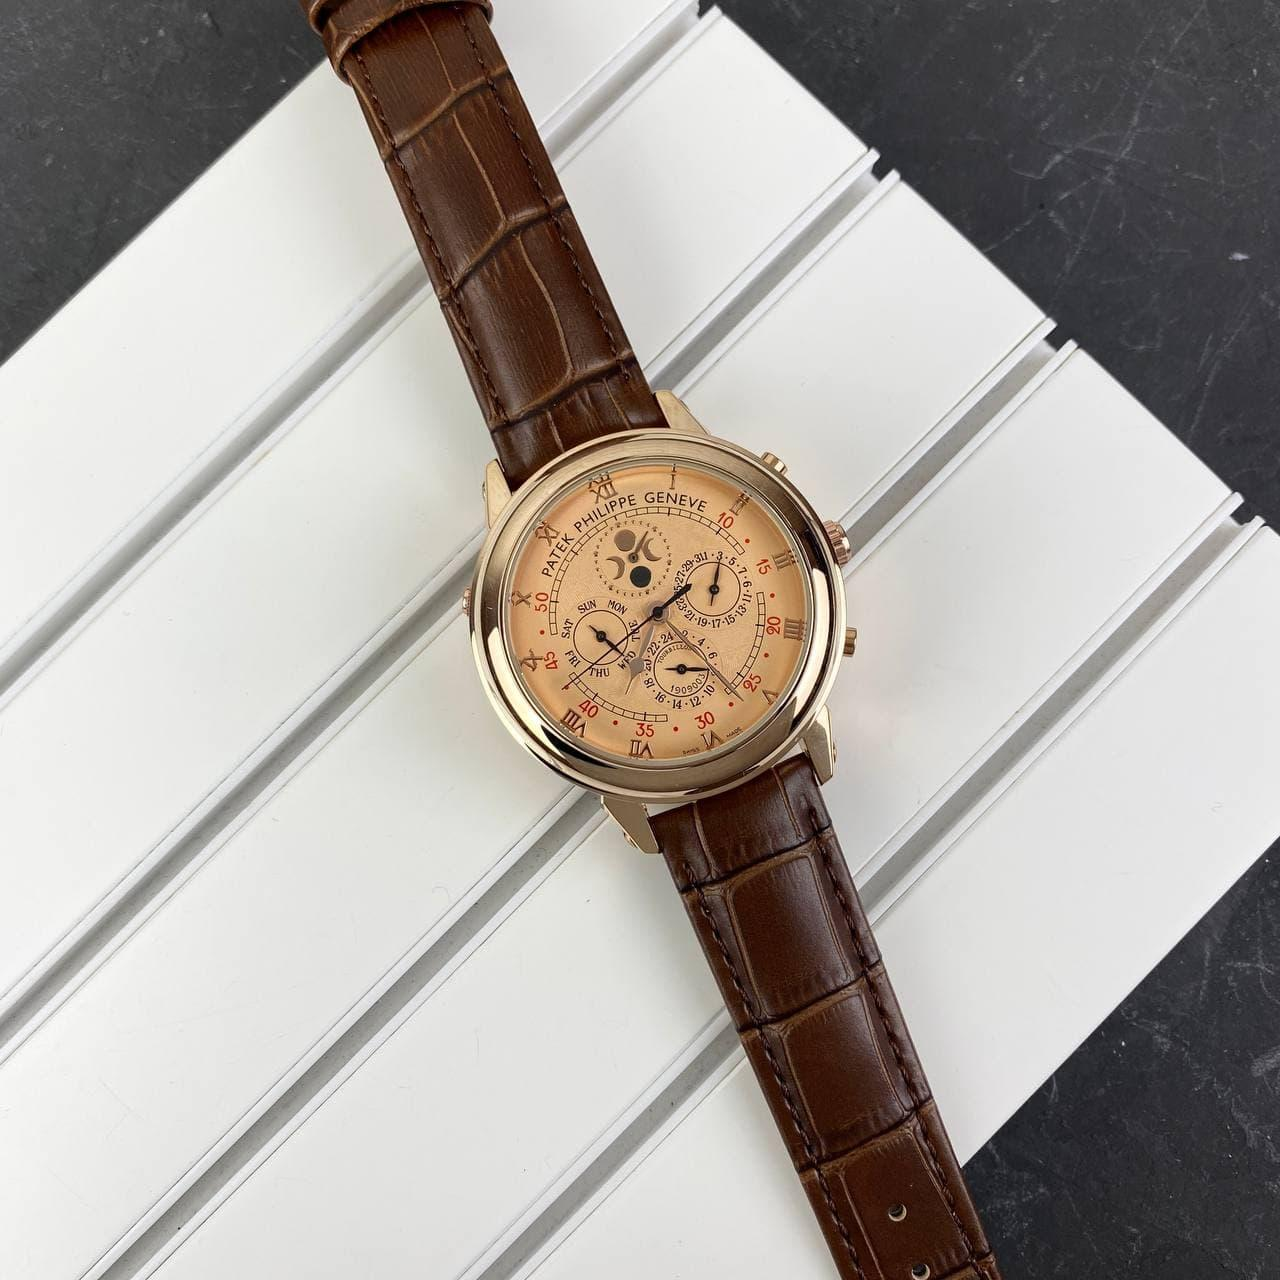 Мужские наручные часы Patek Philippe Grand Complications 5002 Sky Moon Brown-Gold-Milk New